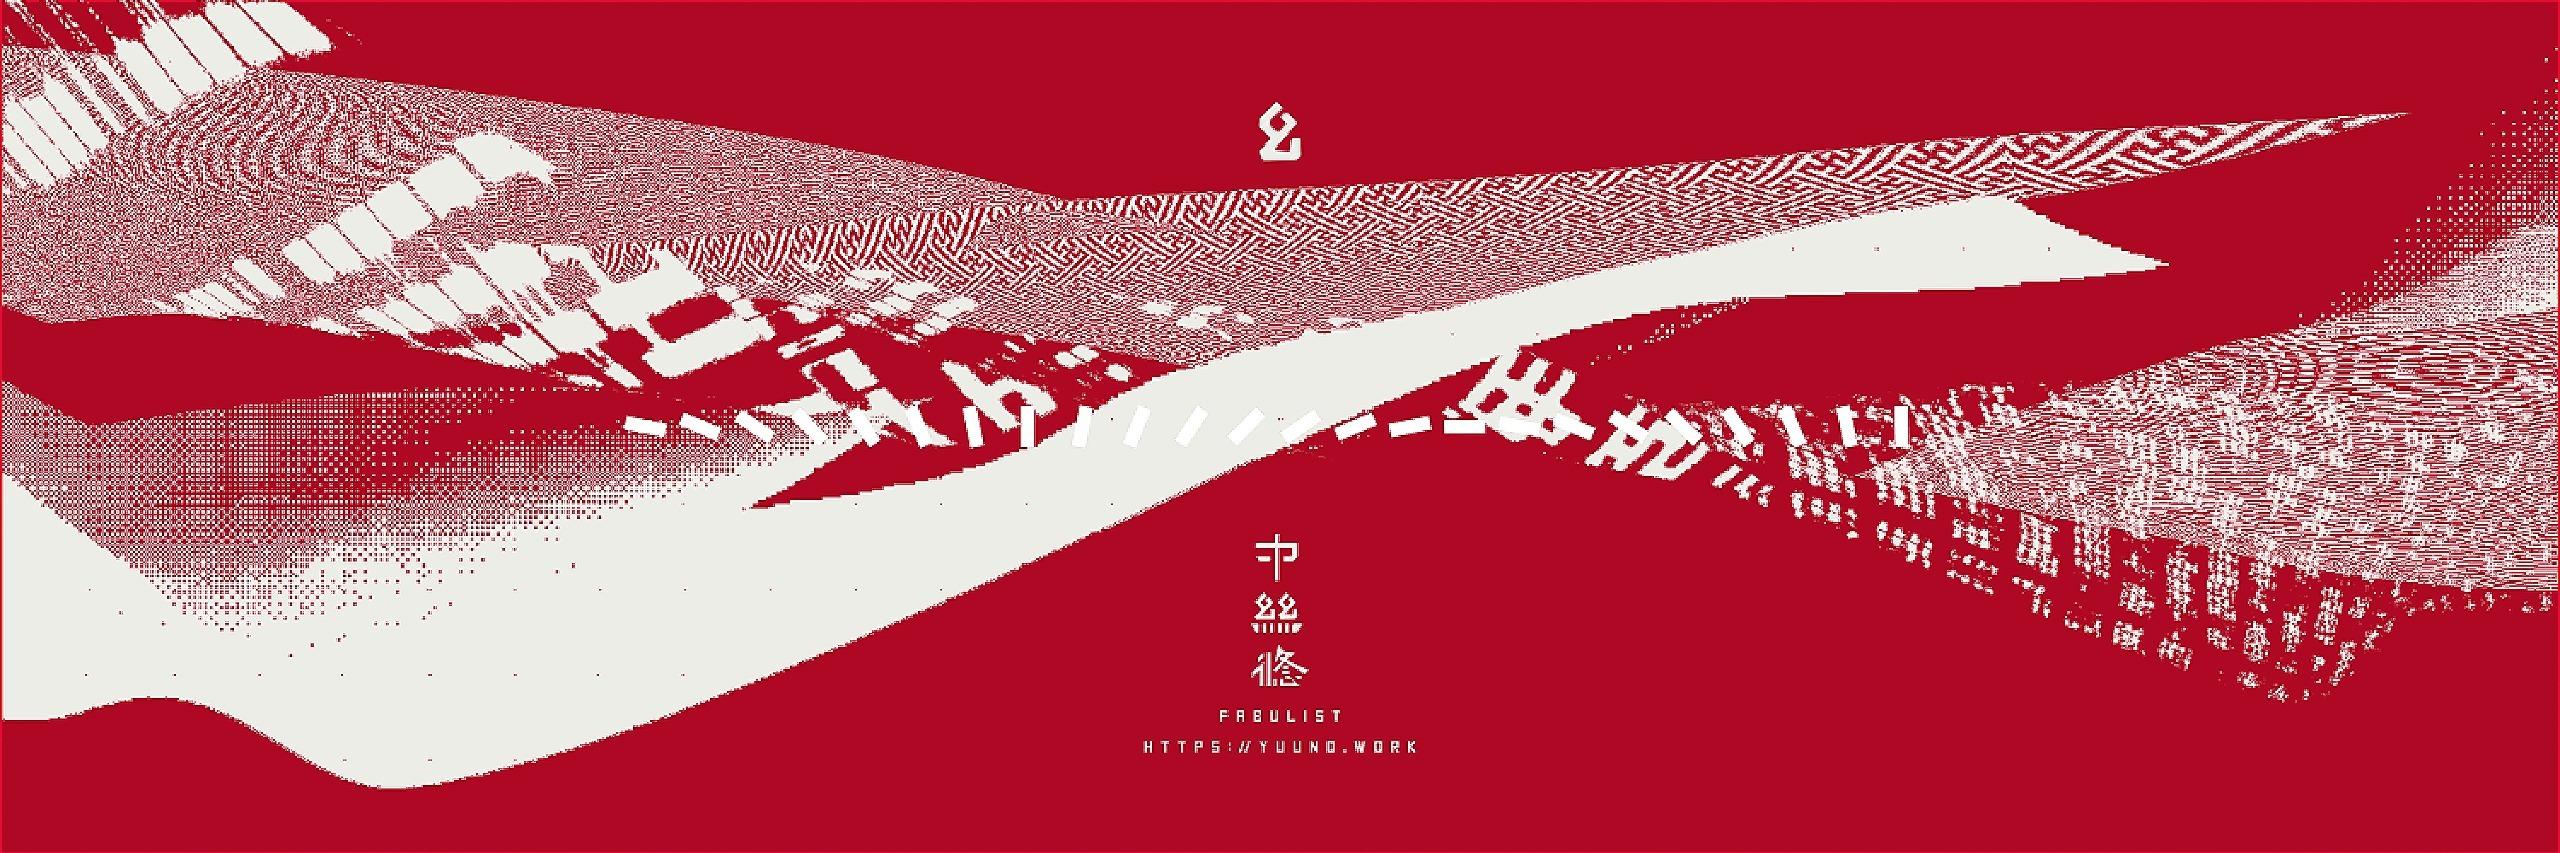 Yū Nakaito (@yu_nakaito) Cover Image